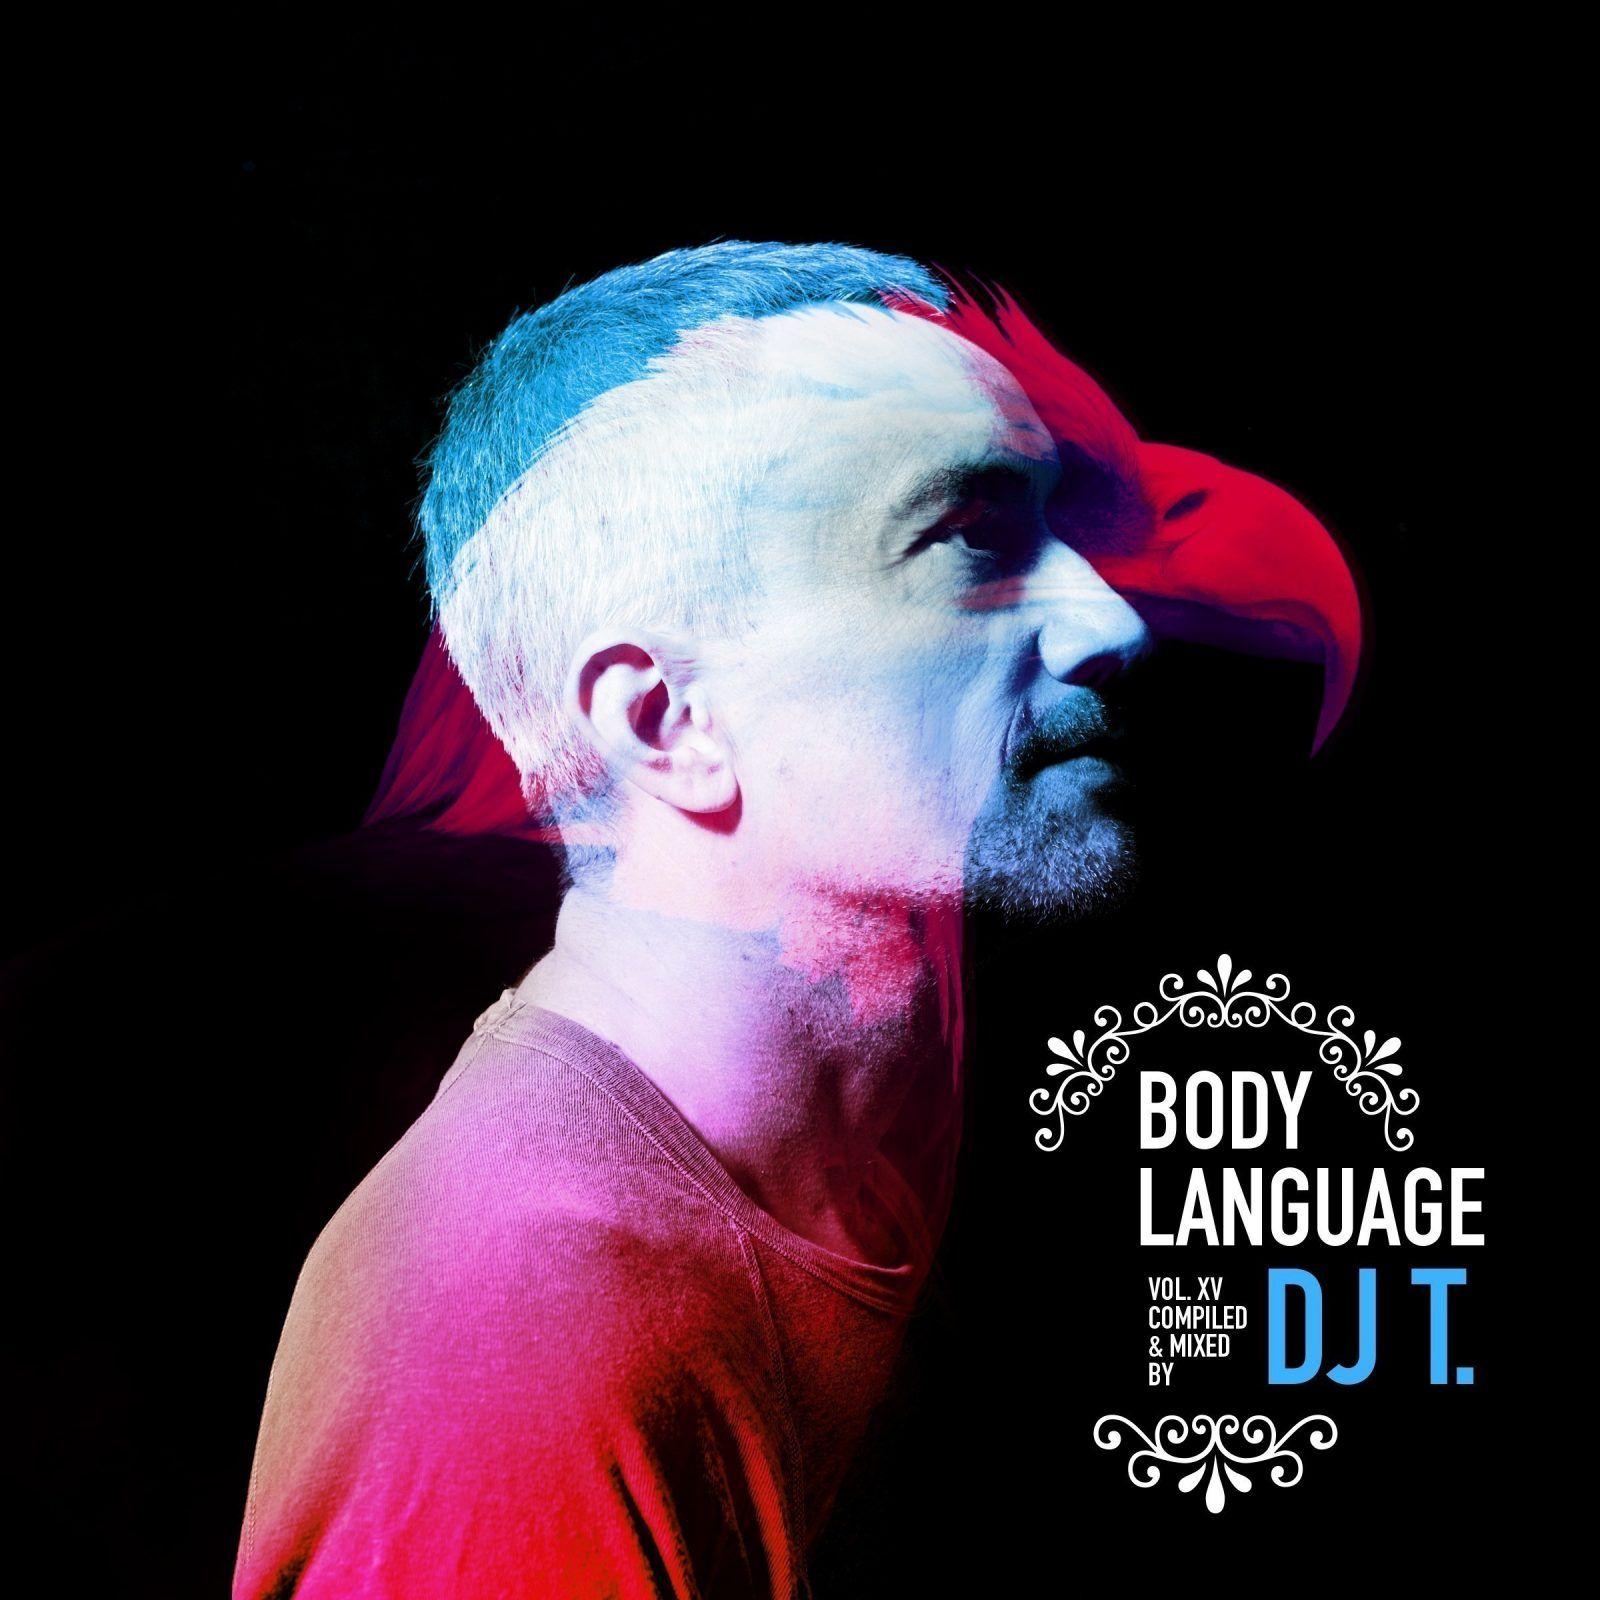 body-language-2400x2400.jpg